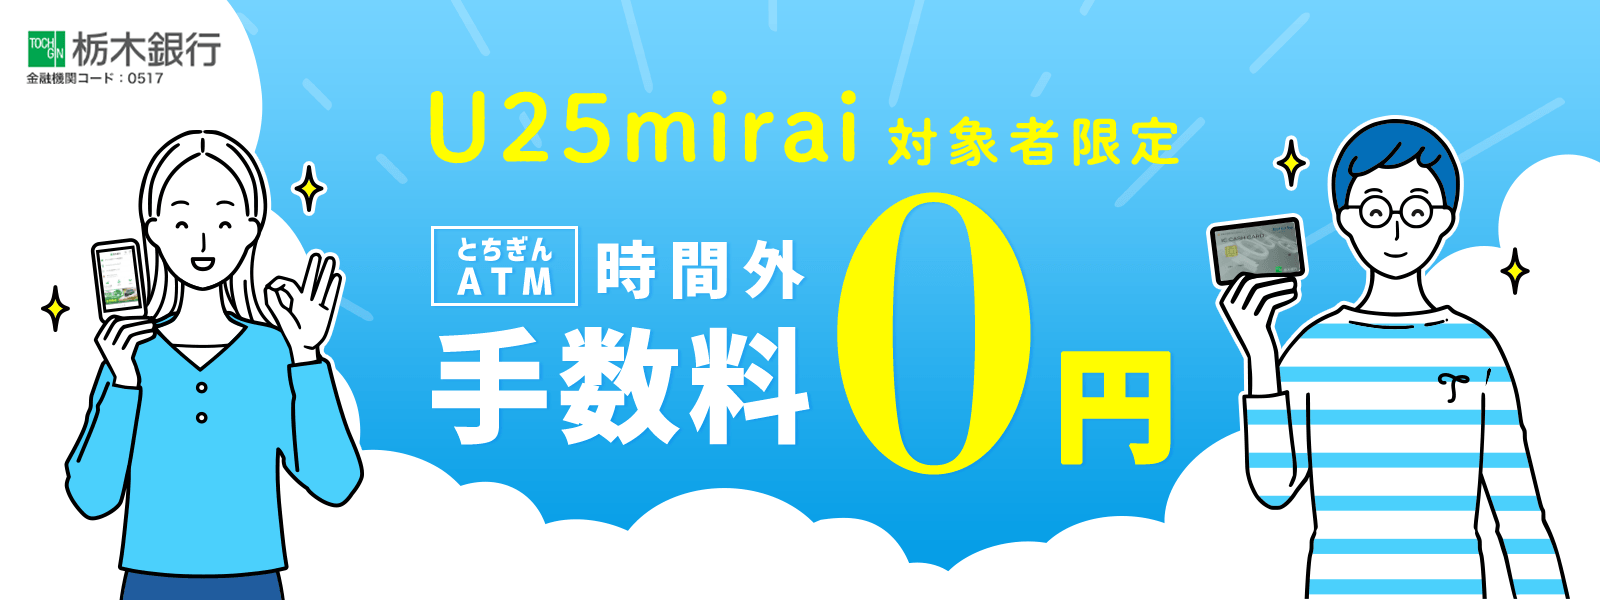 U25mirai